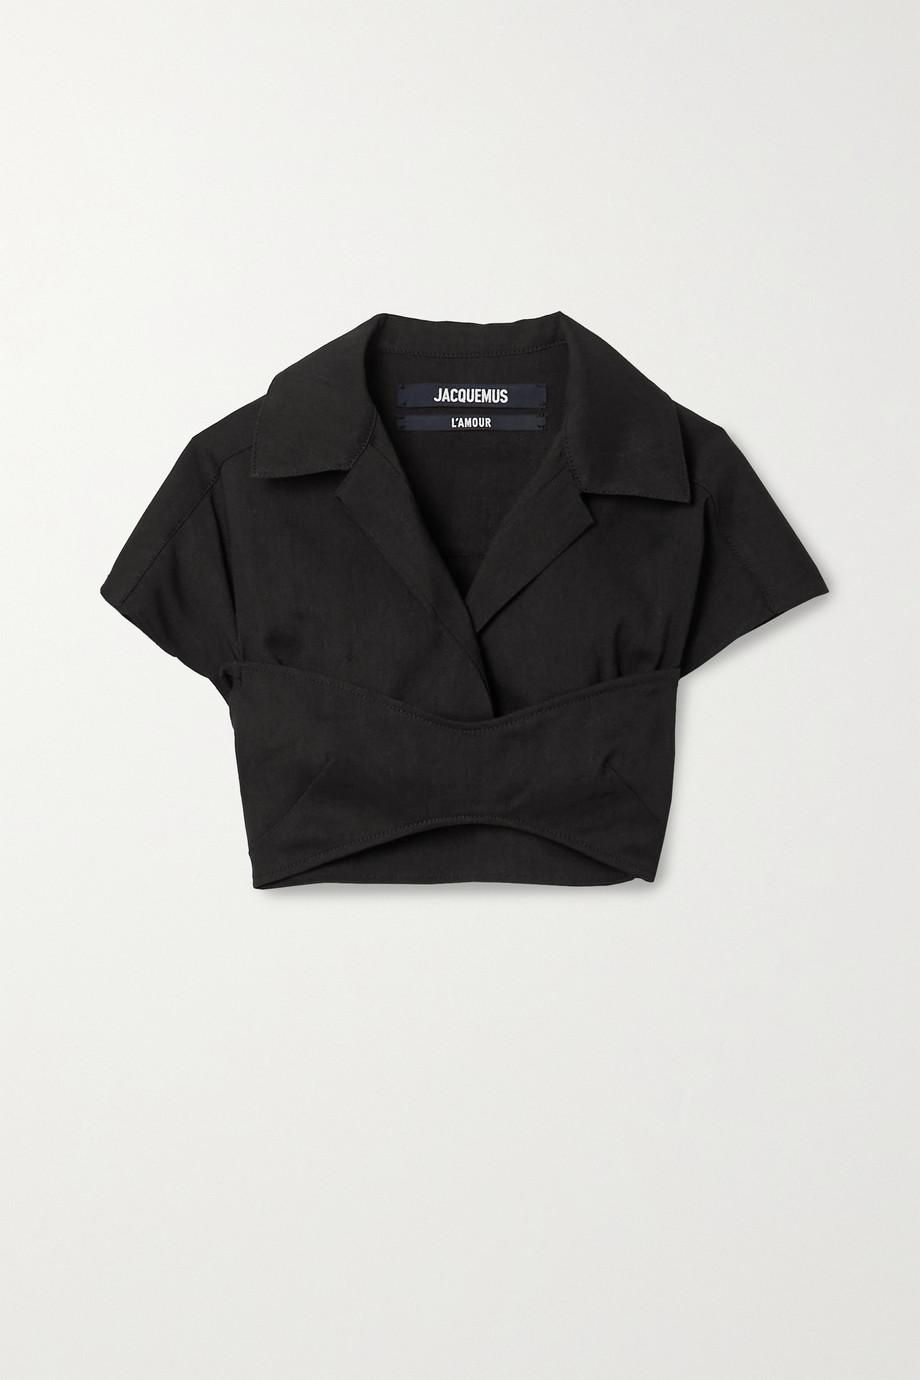 Jacquemus Cropped hemp-blend shirt